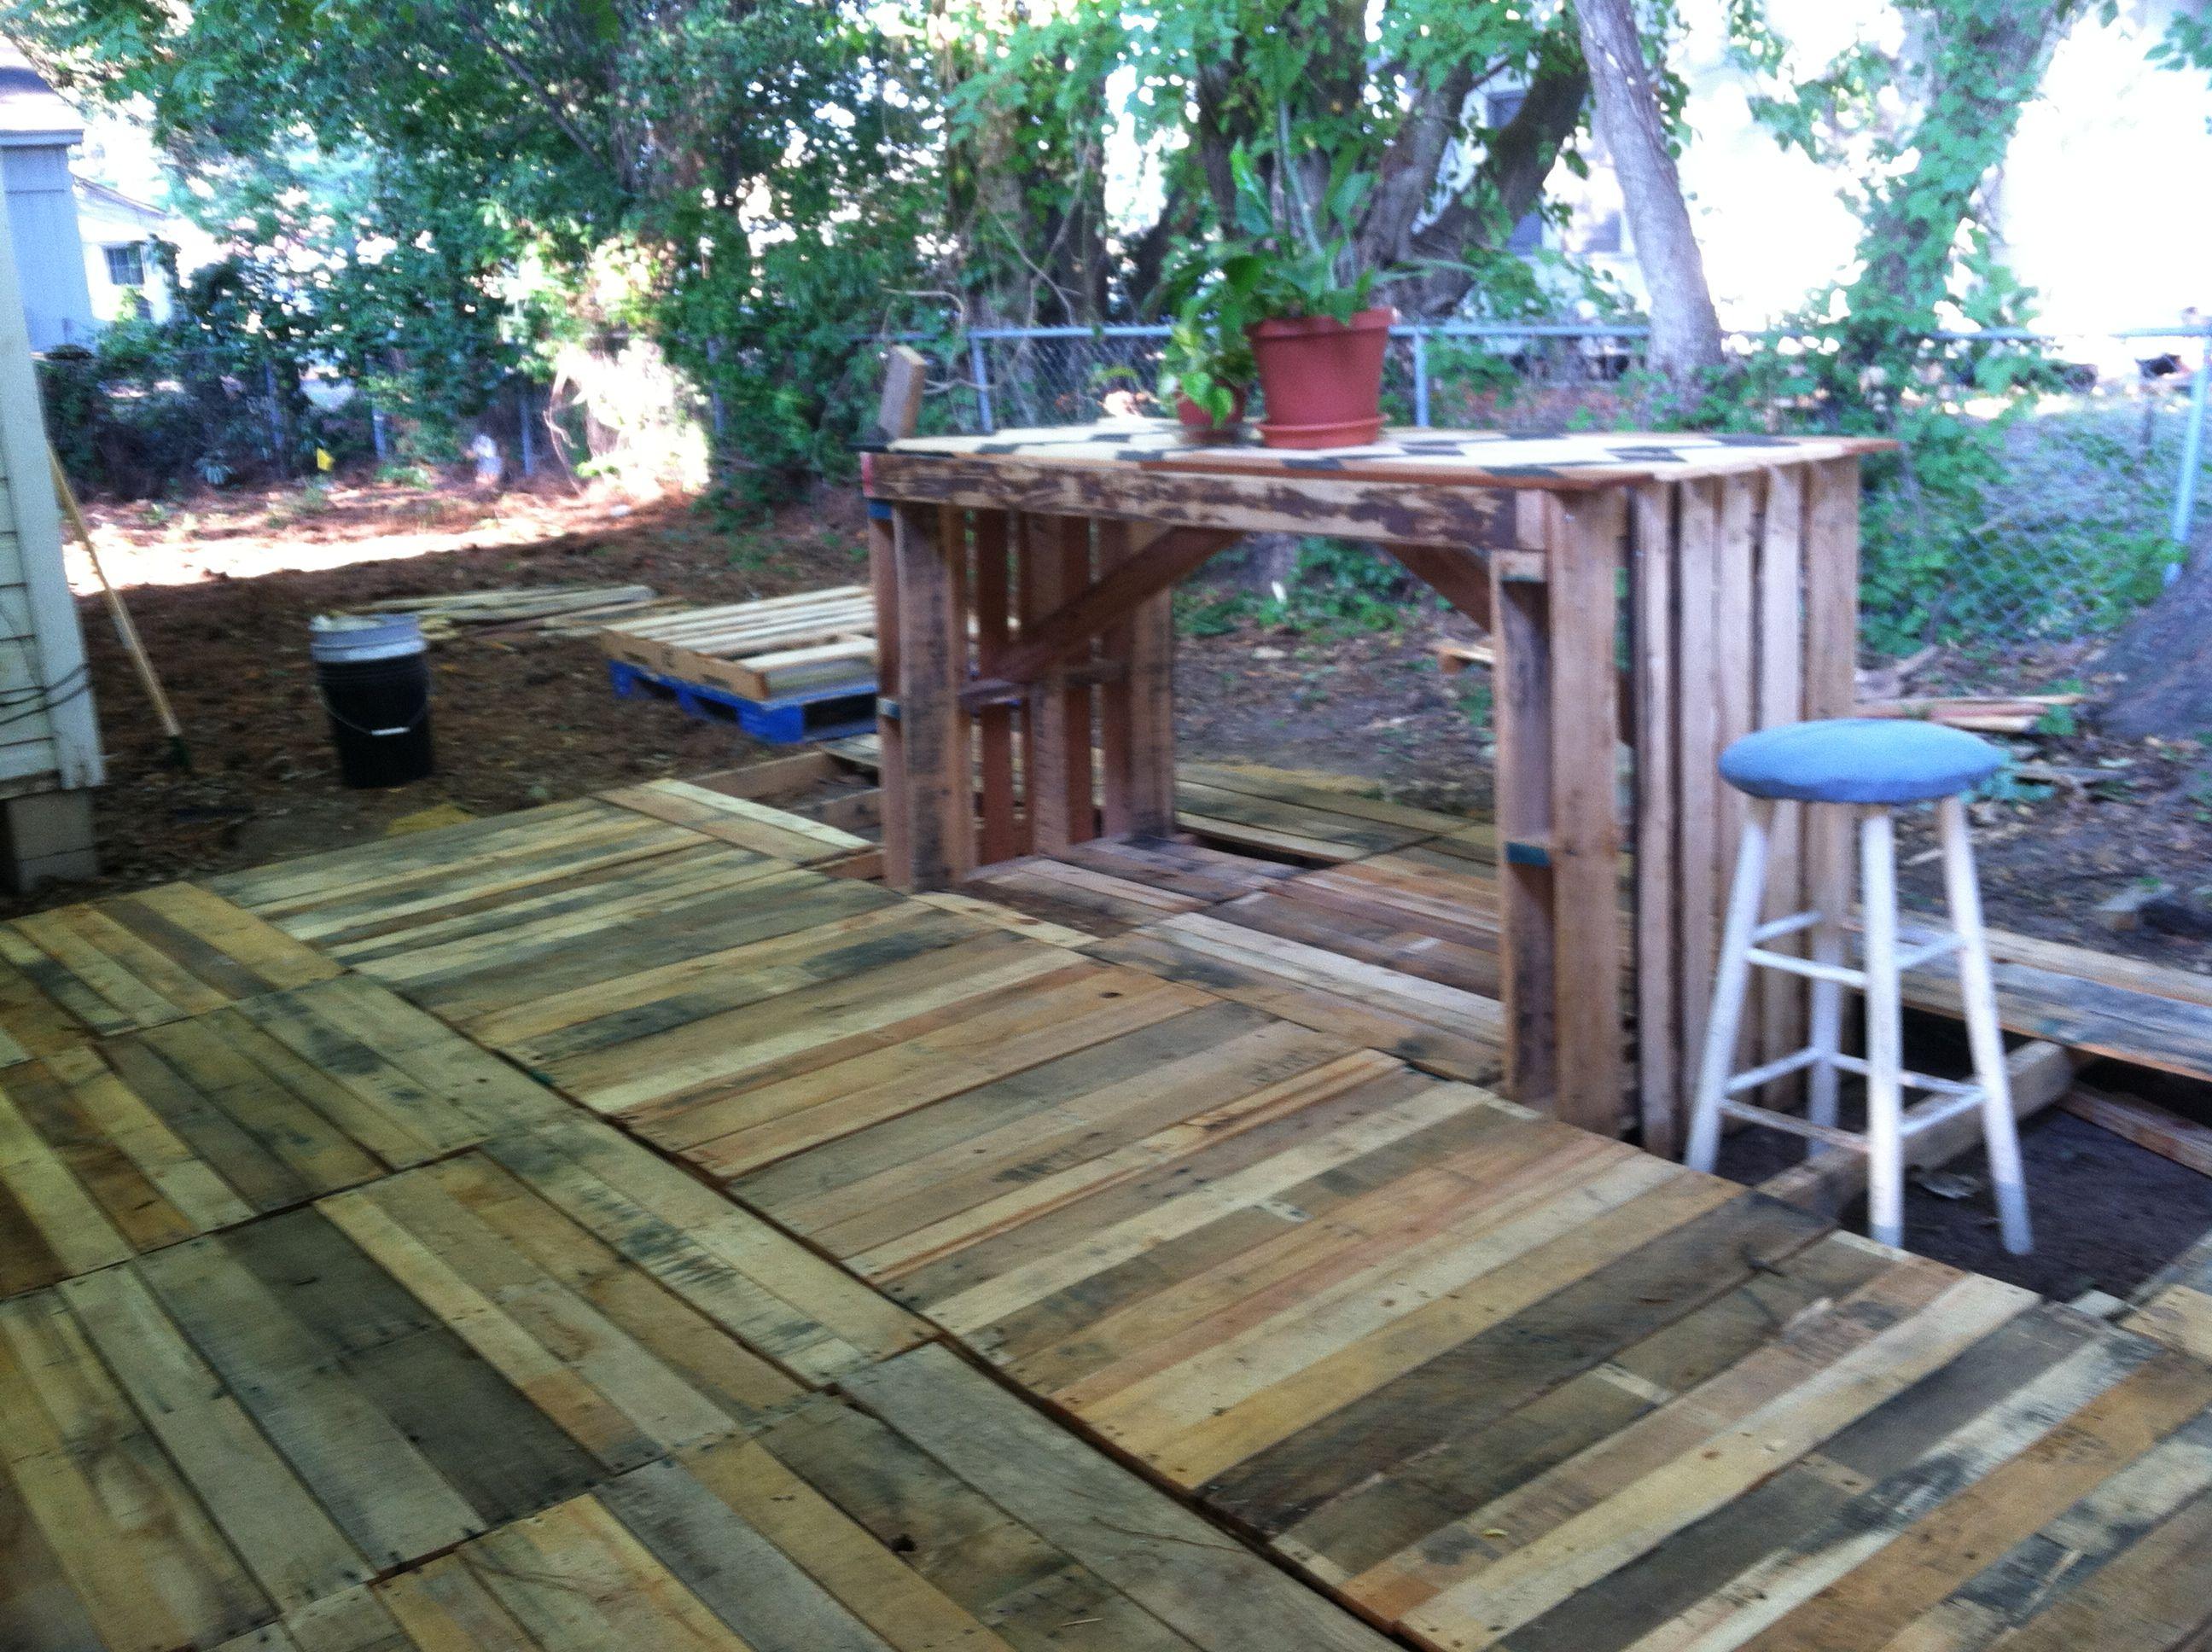 Diy Pallet Deck And Pallet Table Pallet Diy 400 x 300